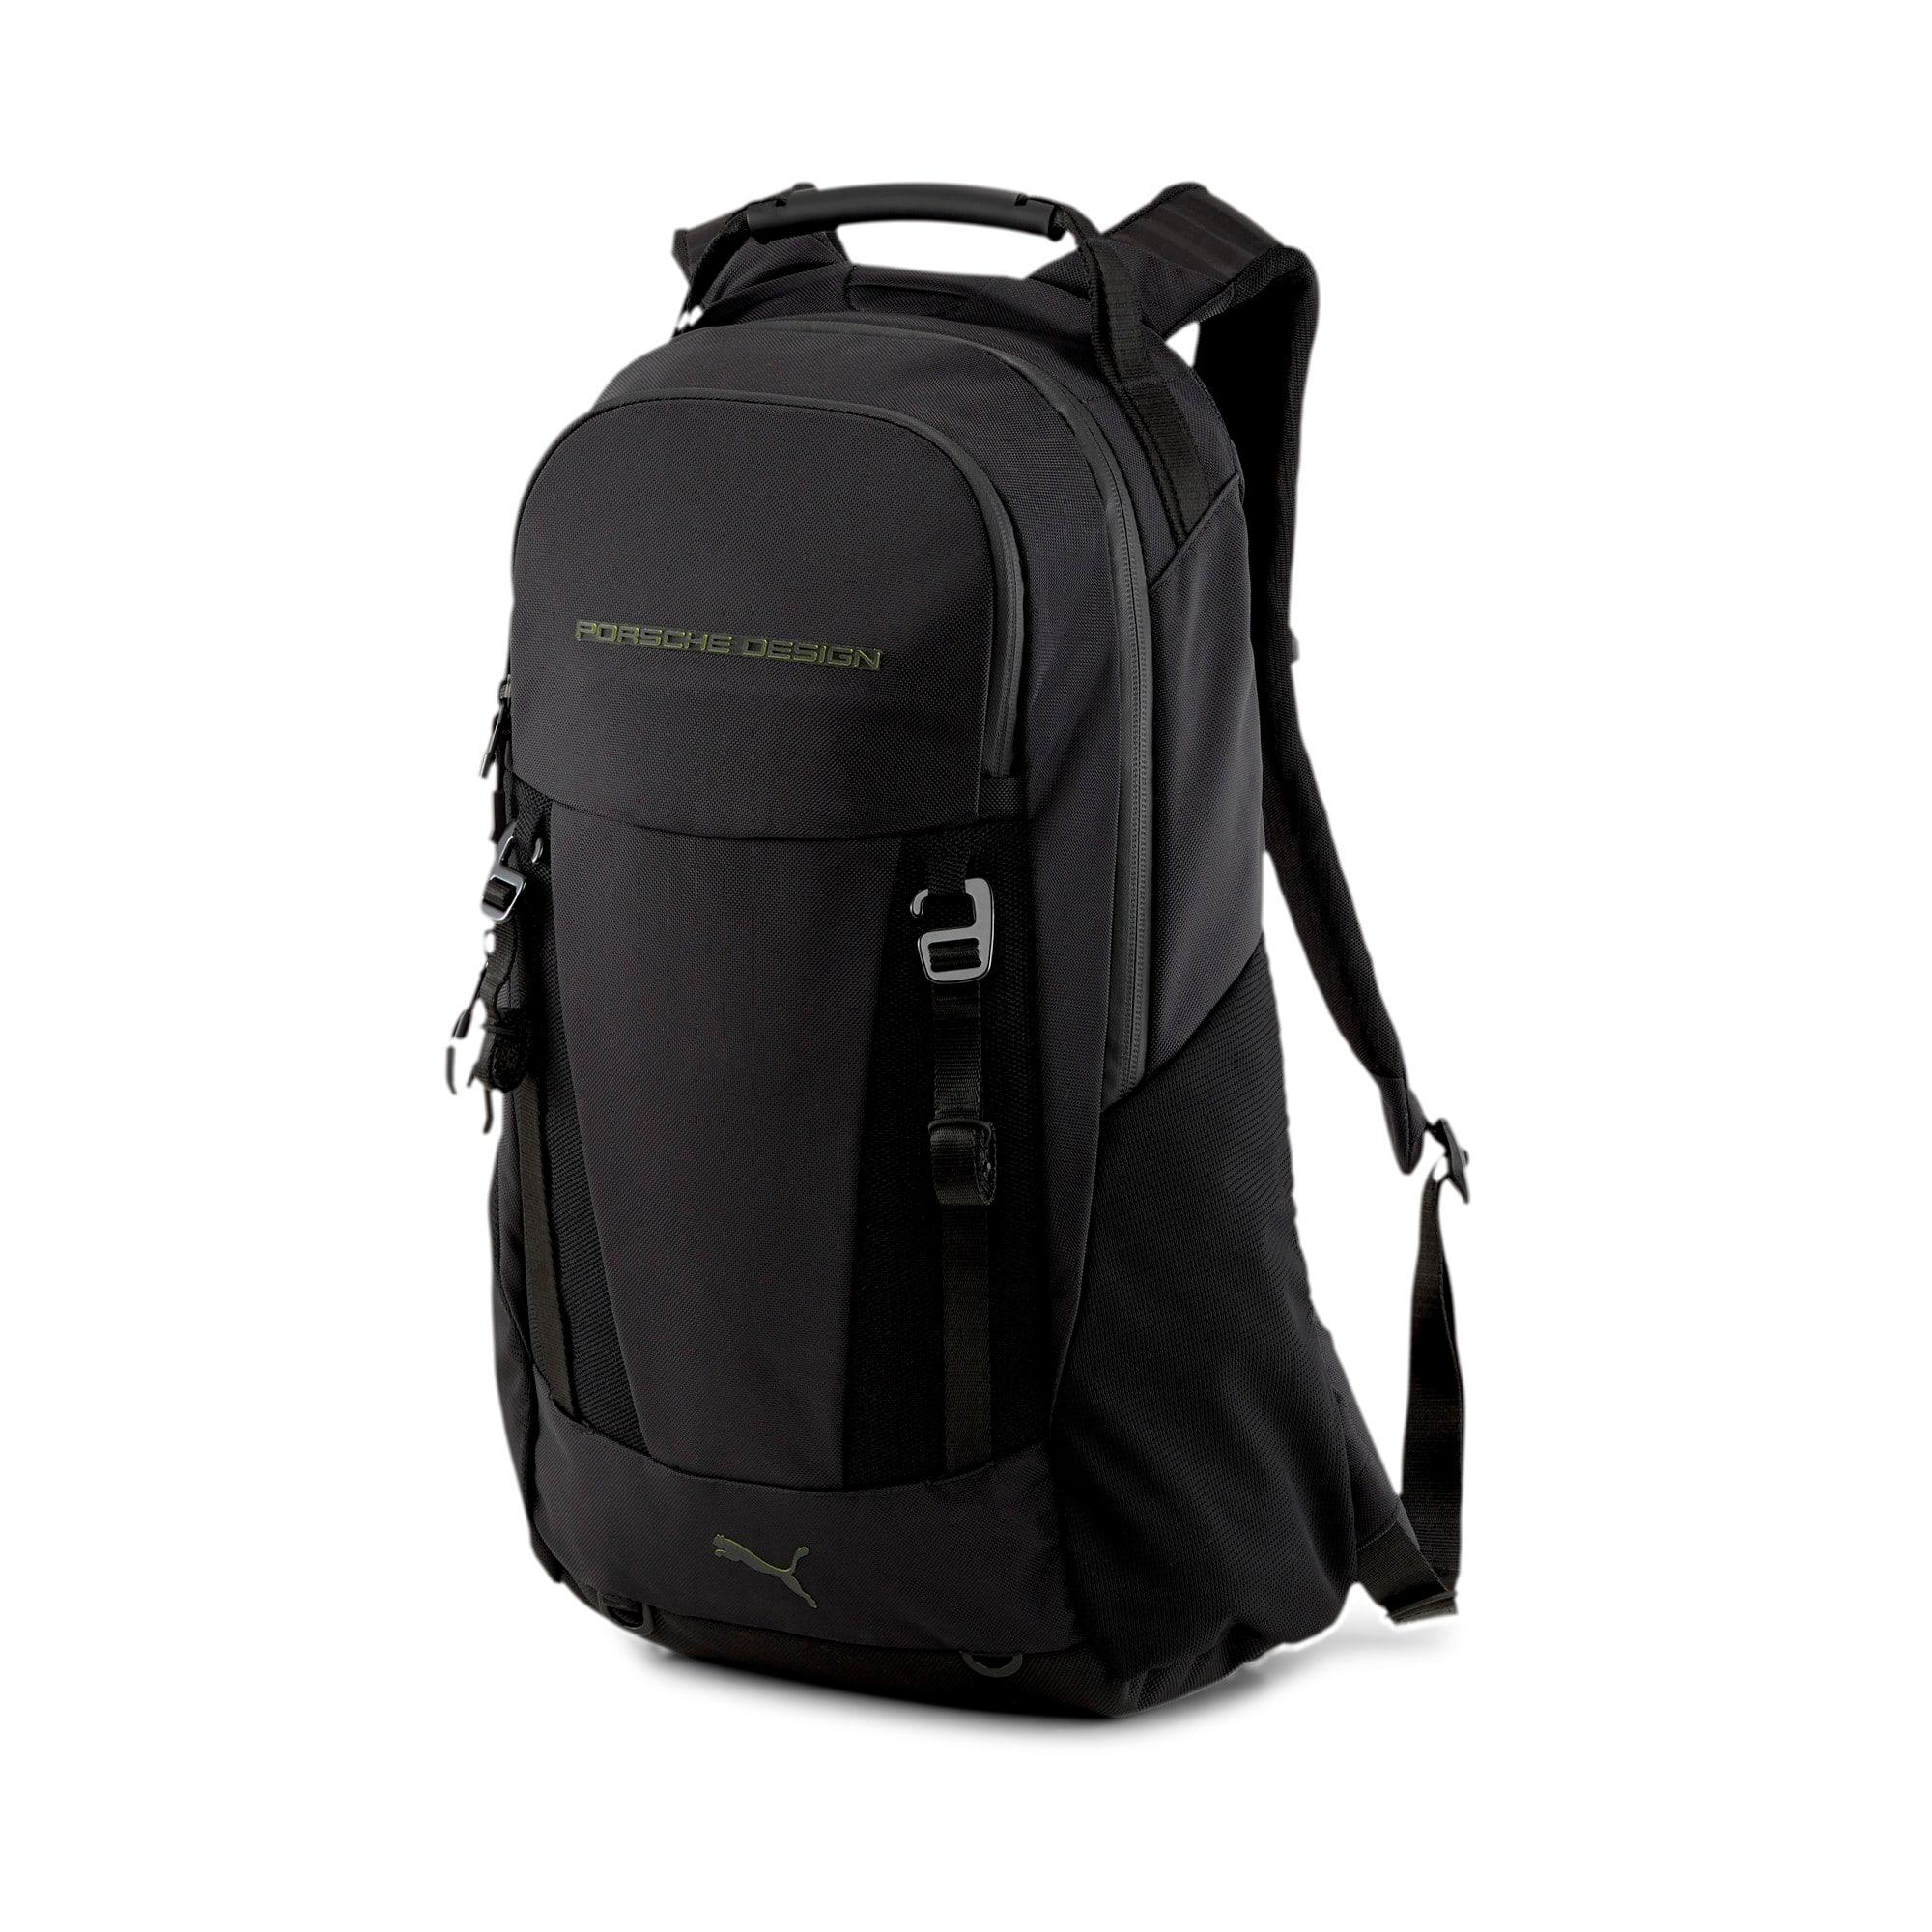 Thumbnail 1 of Porsche Design evoKNIT Active Backpack, Puma Black, medium